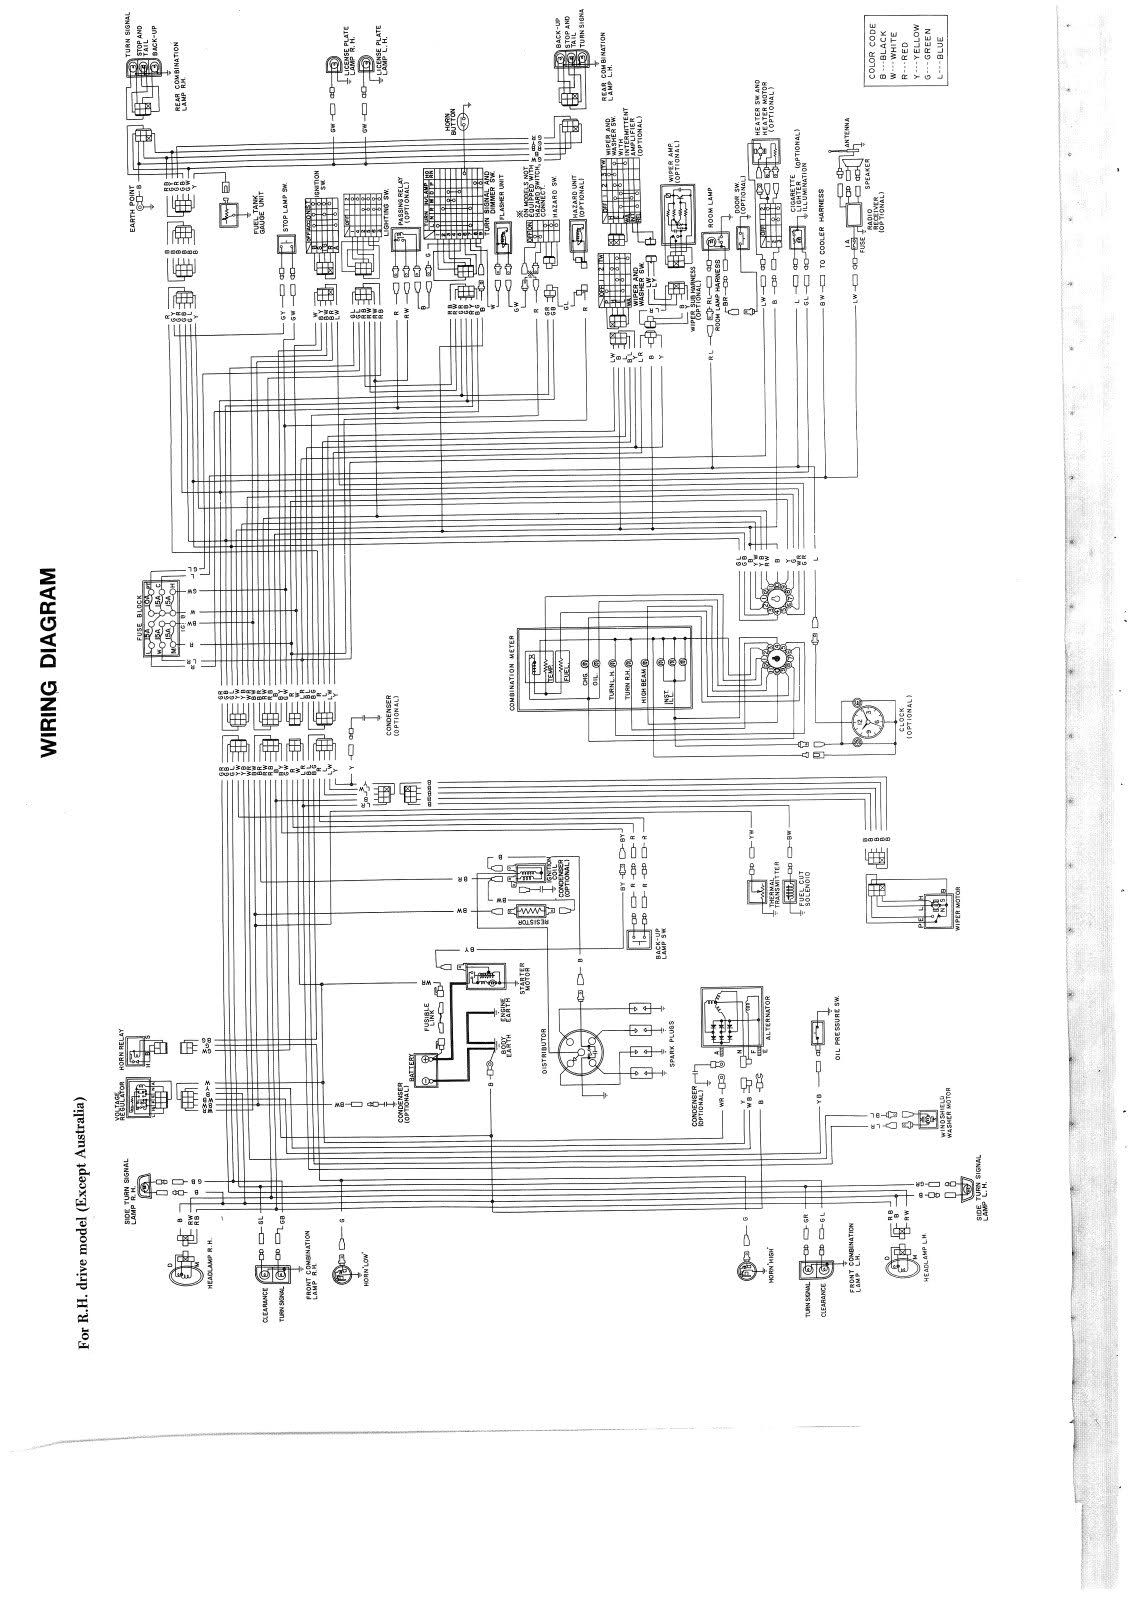 nissan 1400 ignition wiring diagram human bowel for bakkie 6